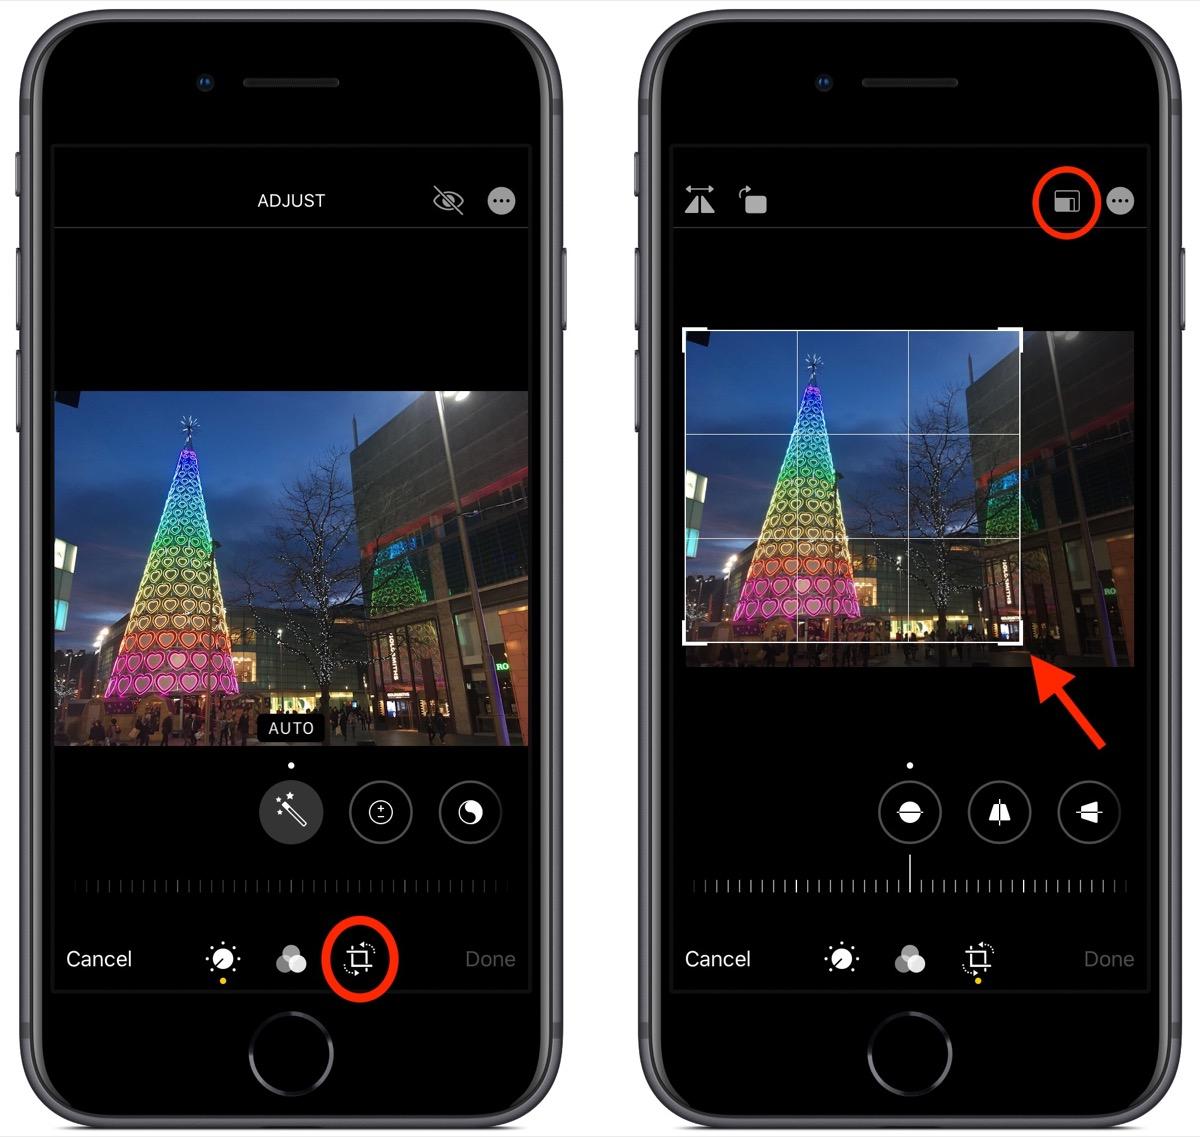 photos editing interface in iOS 13